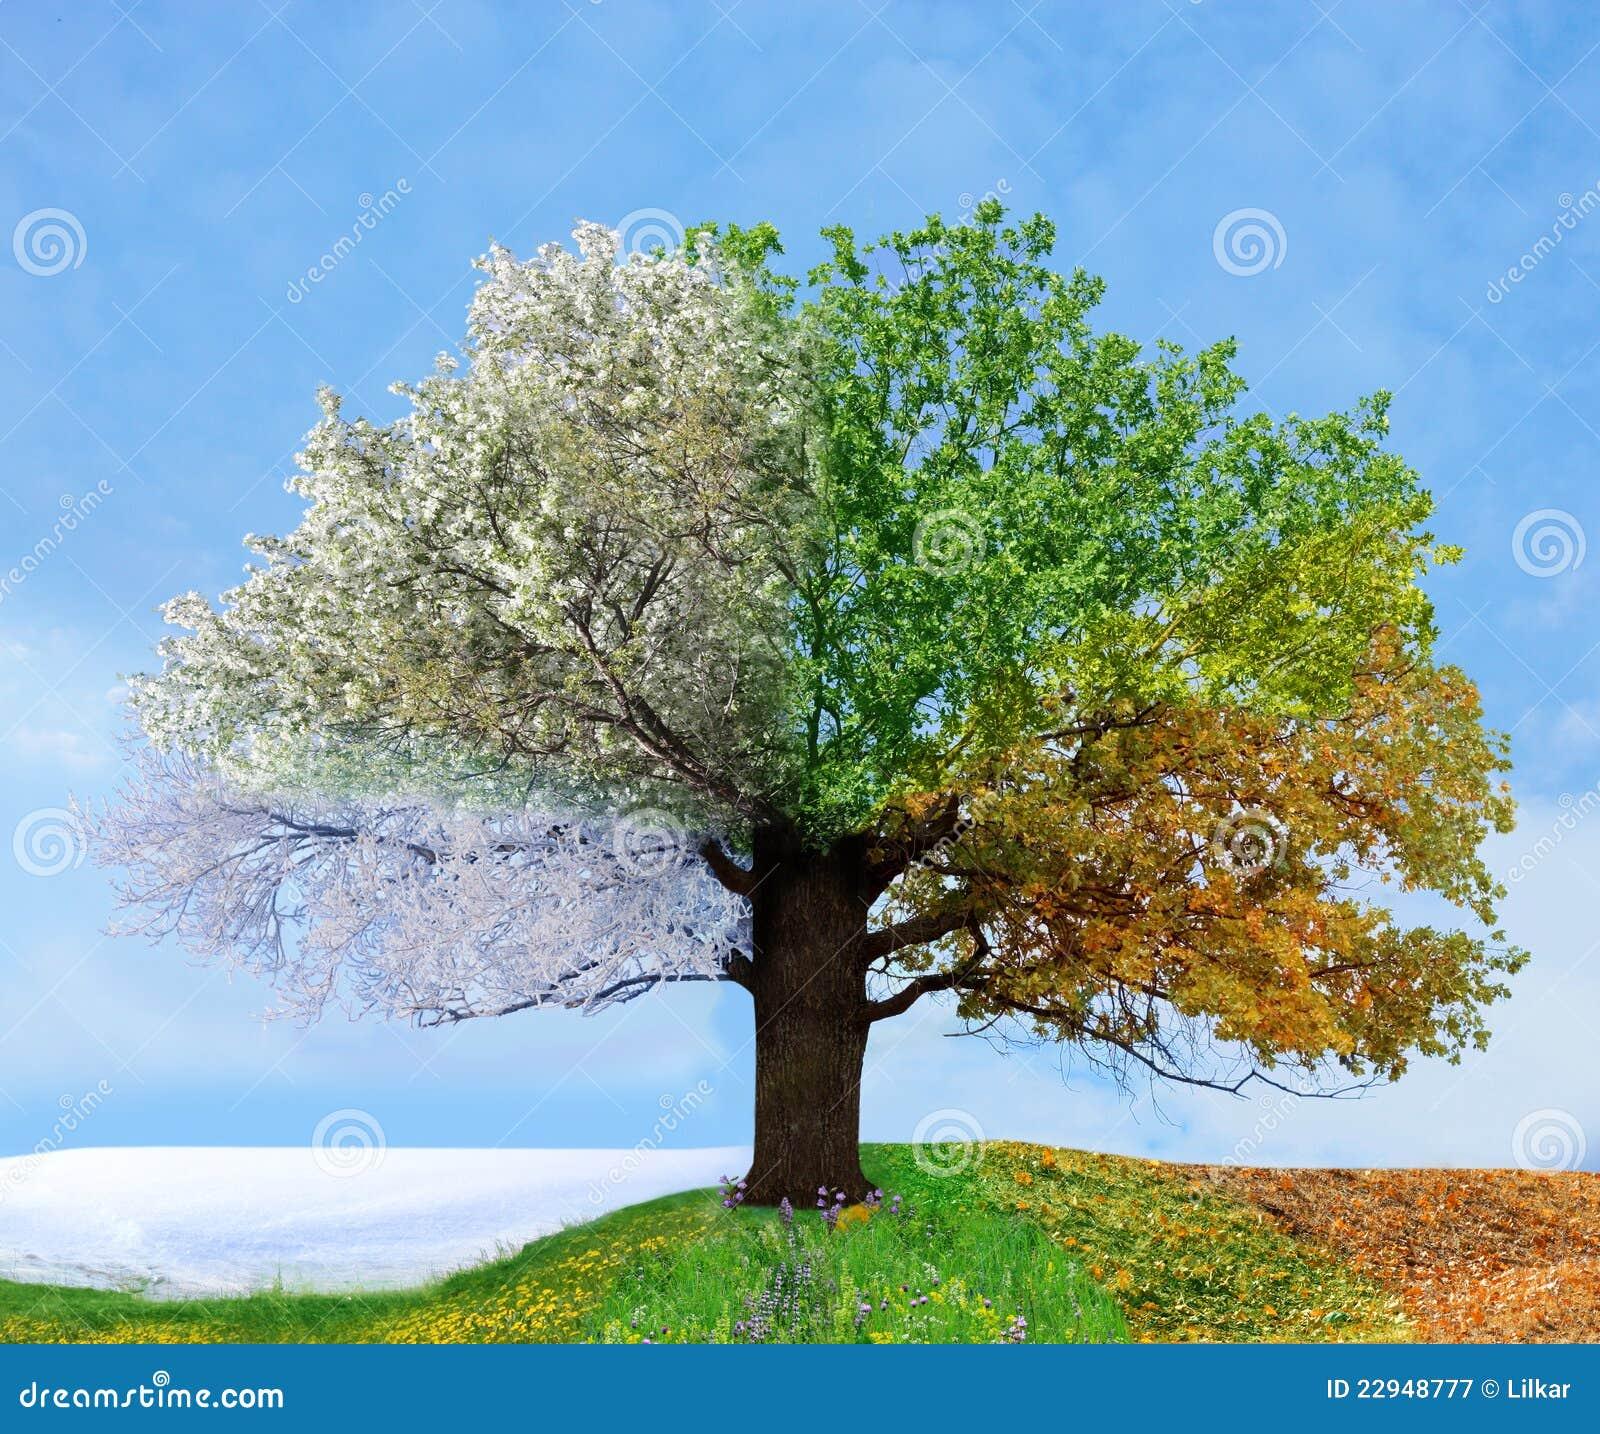 arbre quatre saisons image stock image du lame jardin 22948777. Black Bedroom Furniture Sets. Home Design Ideas